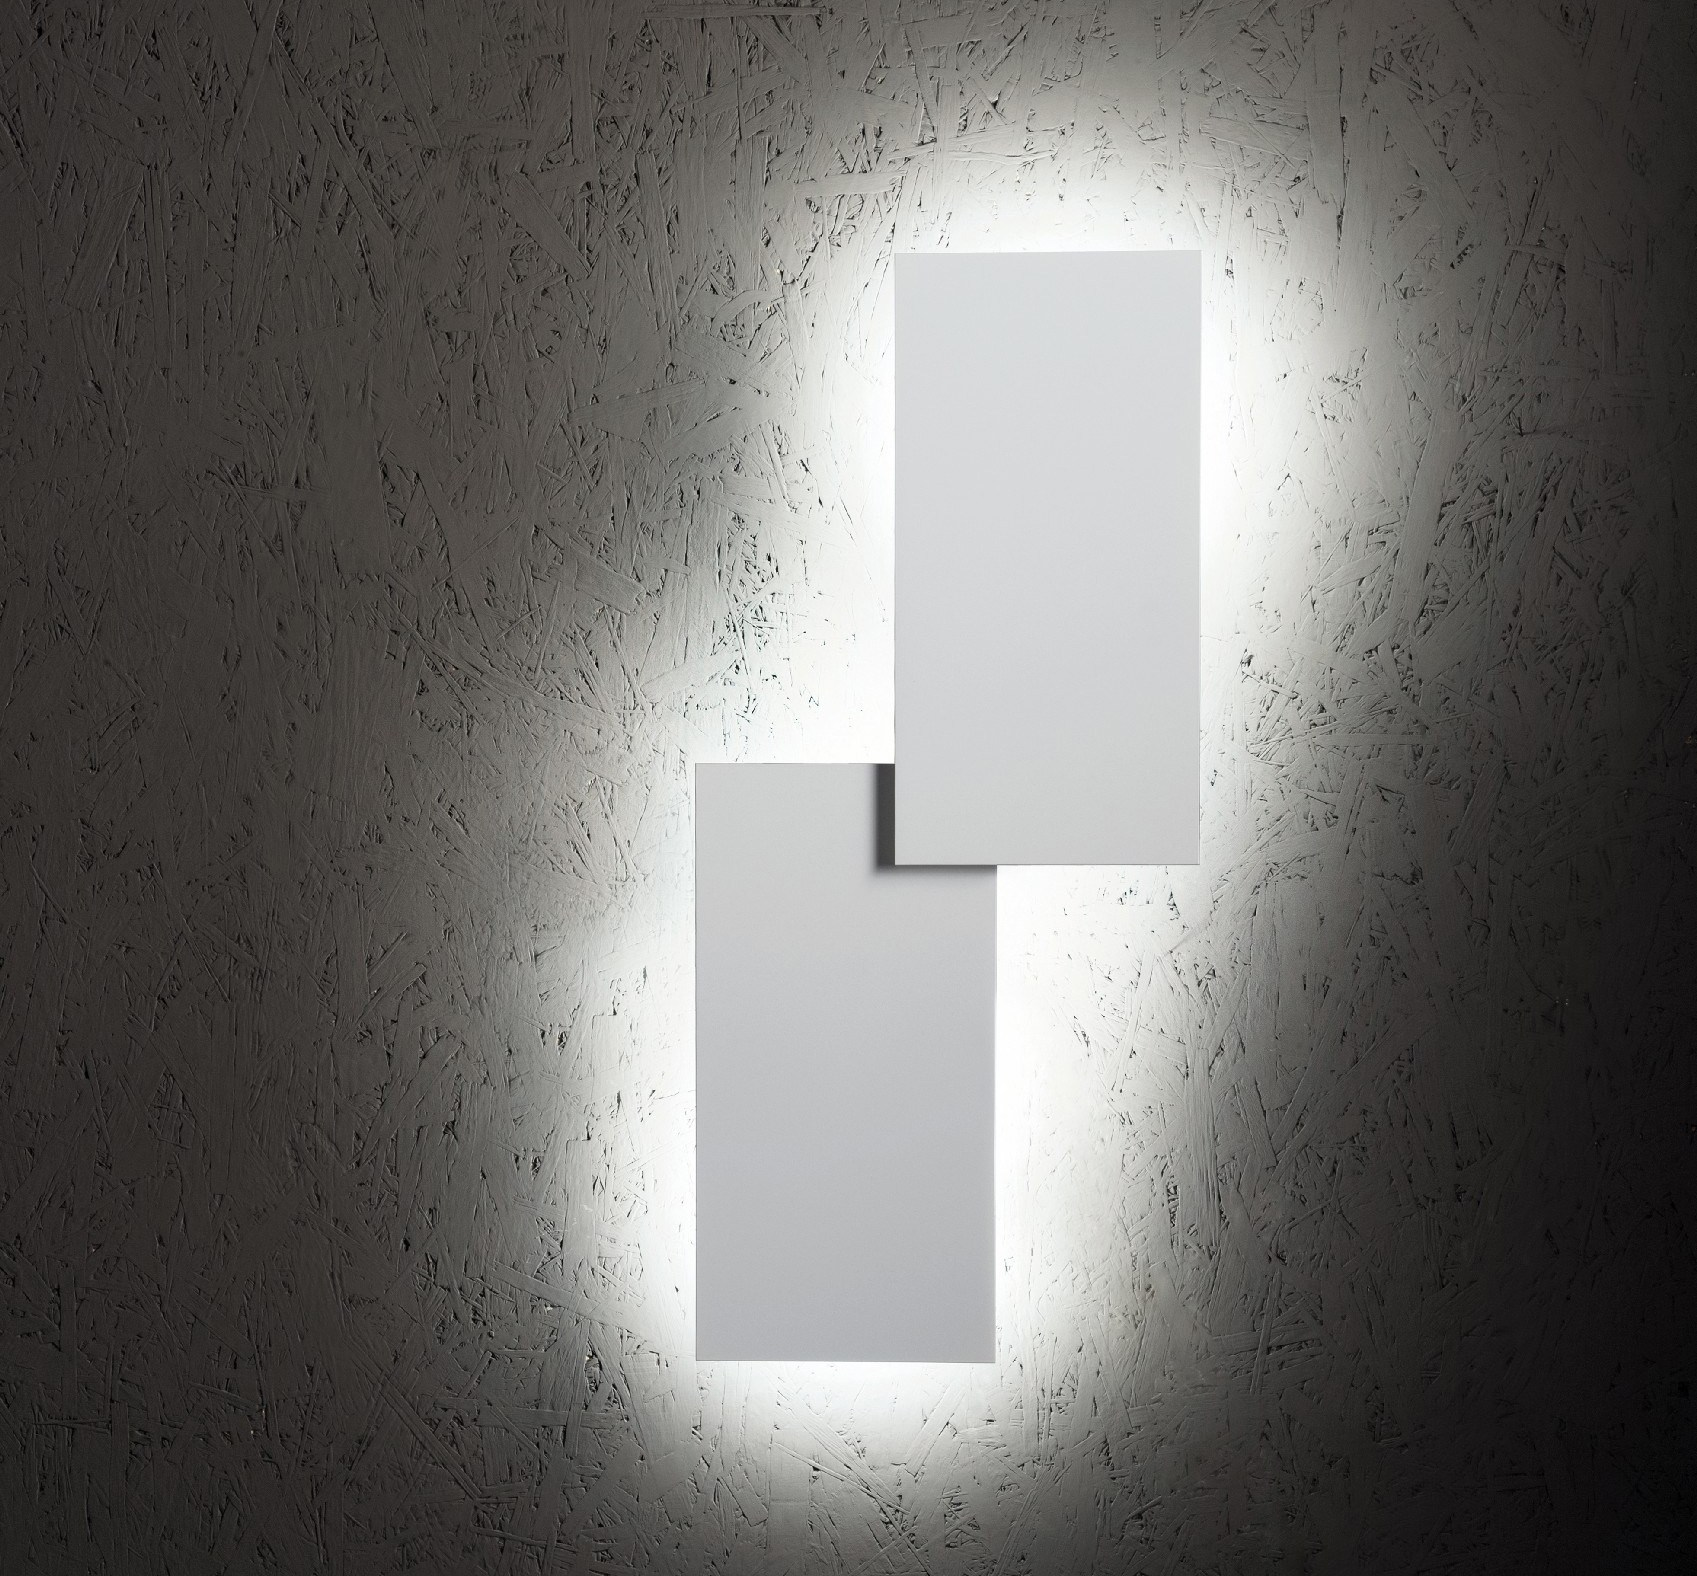 puzzle ap0 wandleuchte led von studio italia design. Black Bedroom Furniture Sets. Home Design Ideas